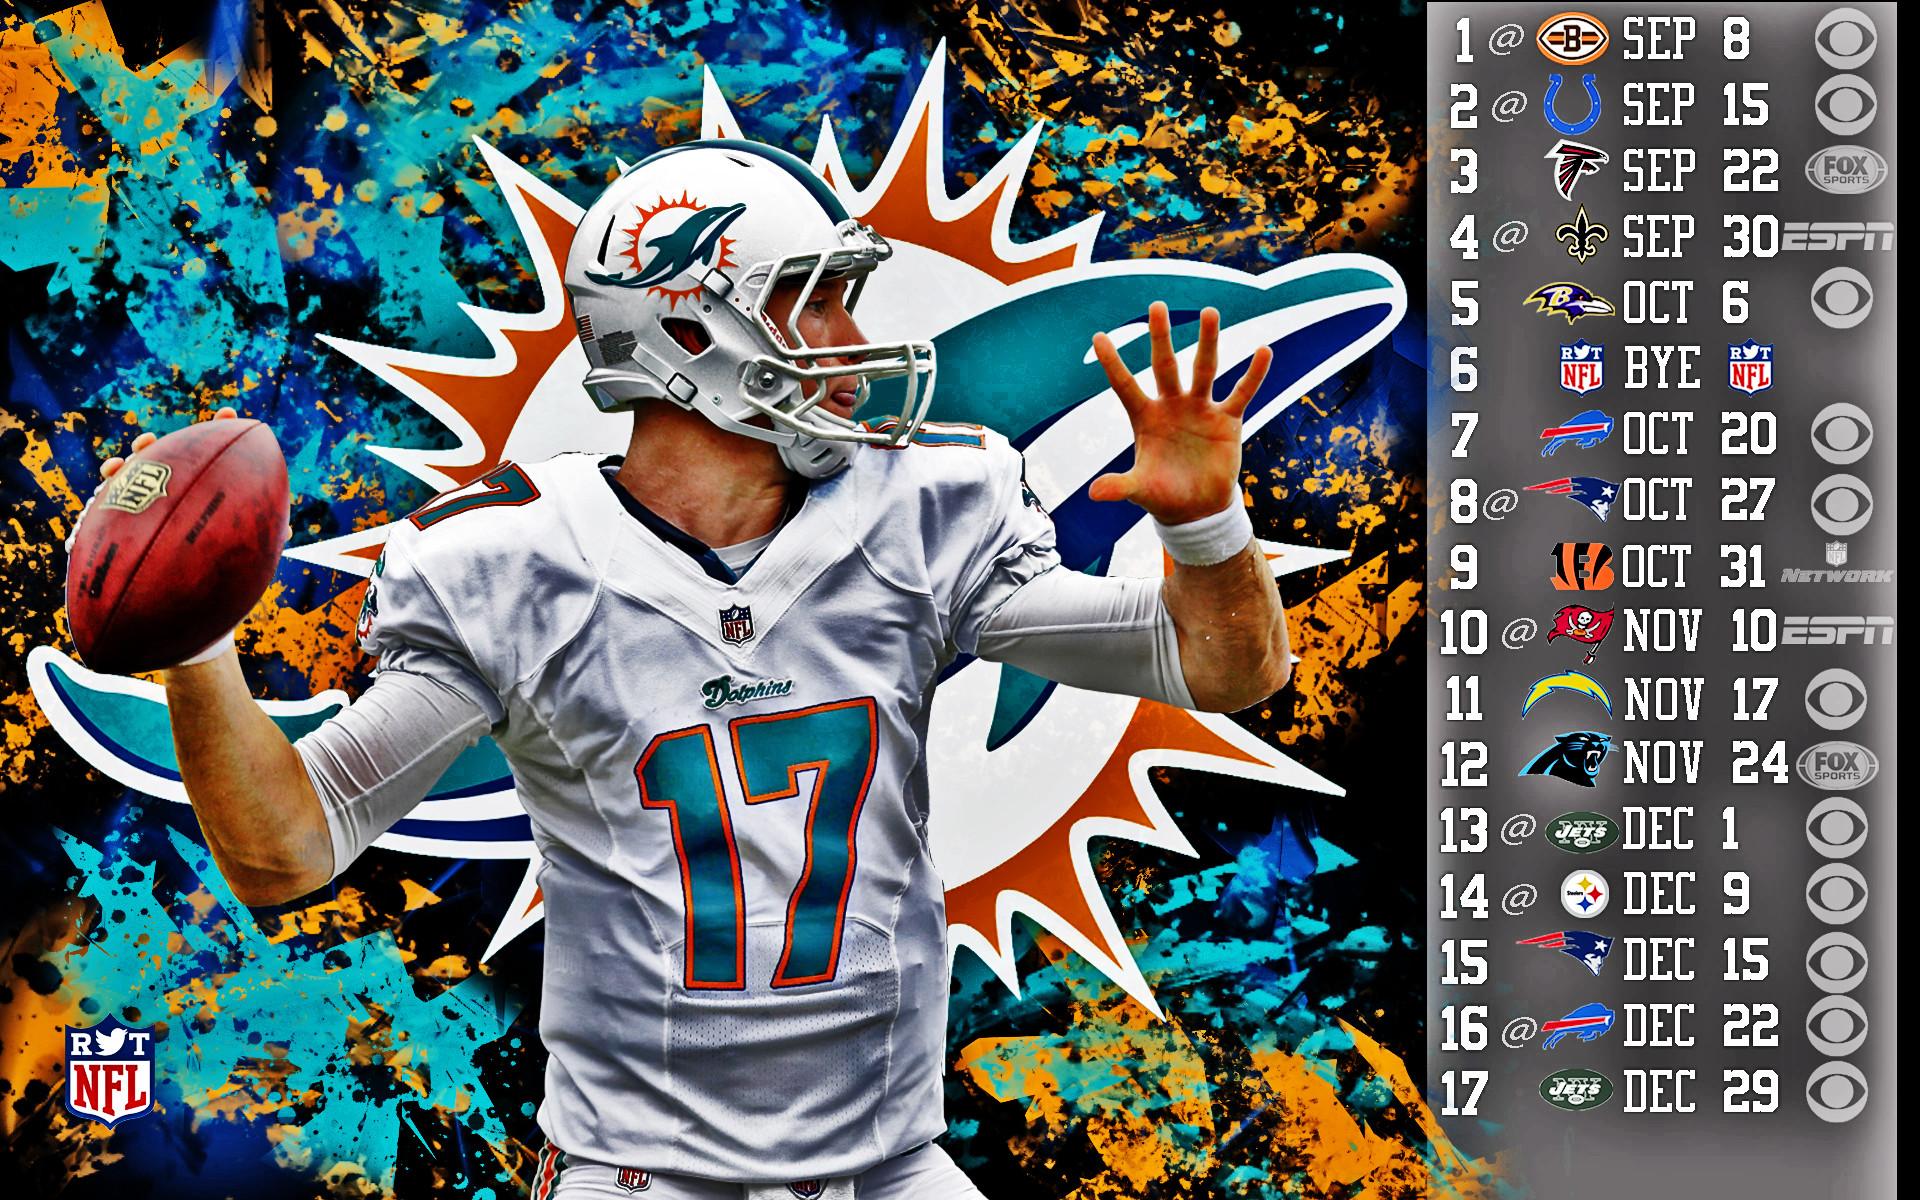 2013 Miami Dolphins football nfl wallpaper     130416 .